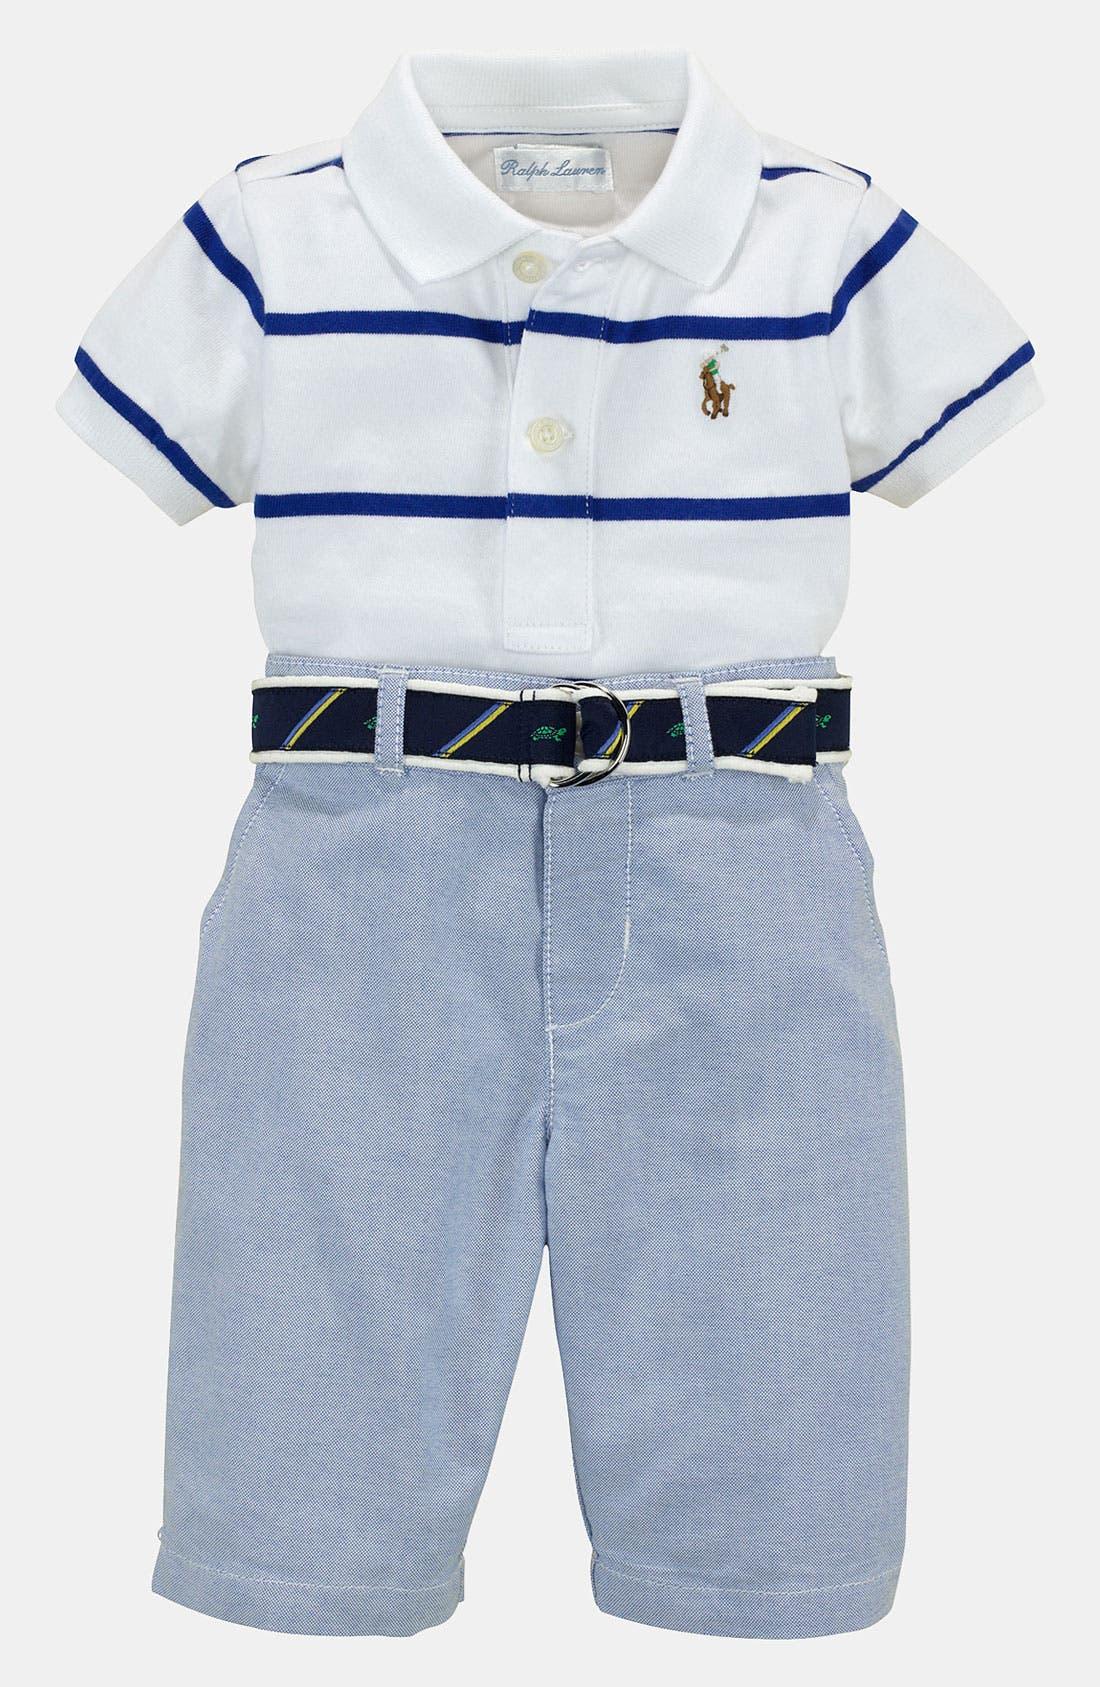 Alternate Image 2  - Ralph Lauren Polo & Pants (Baby)